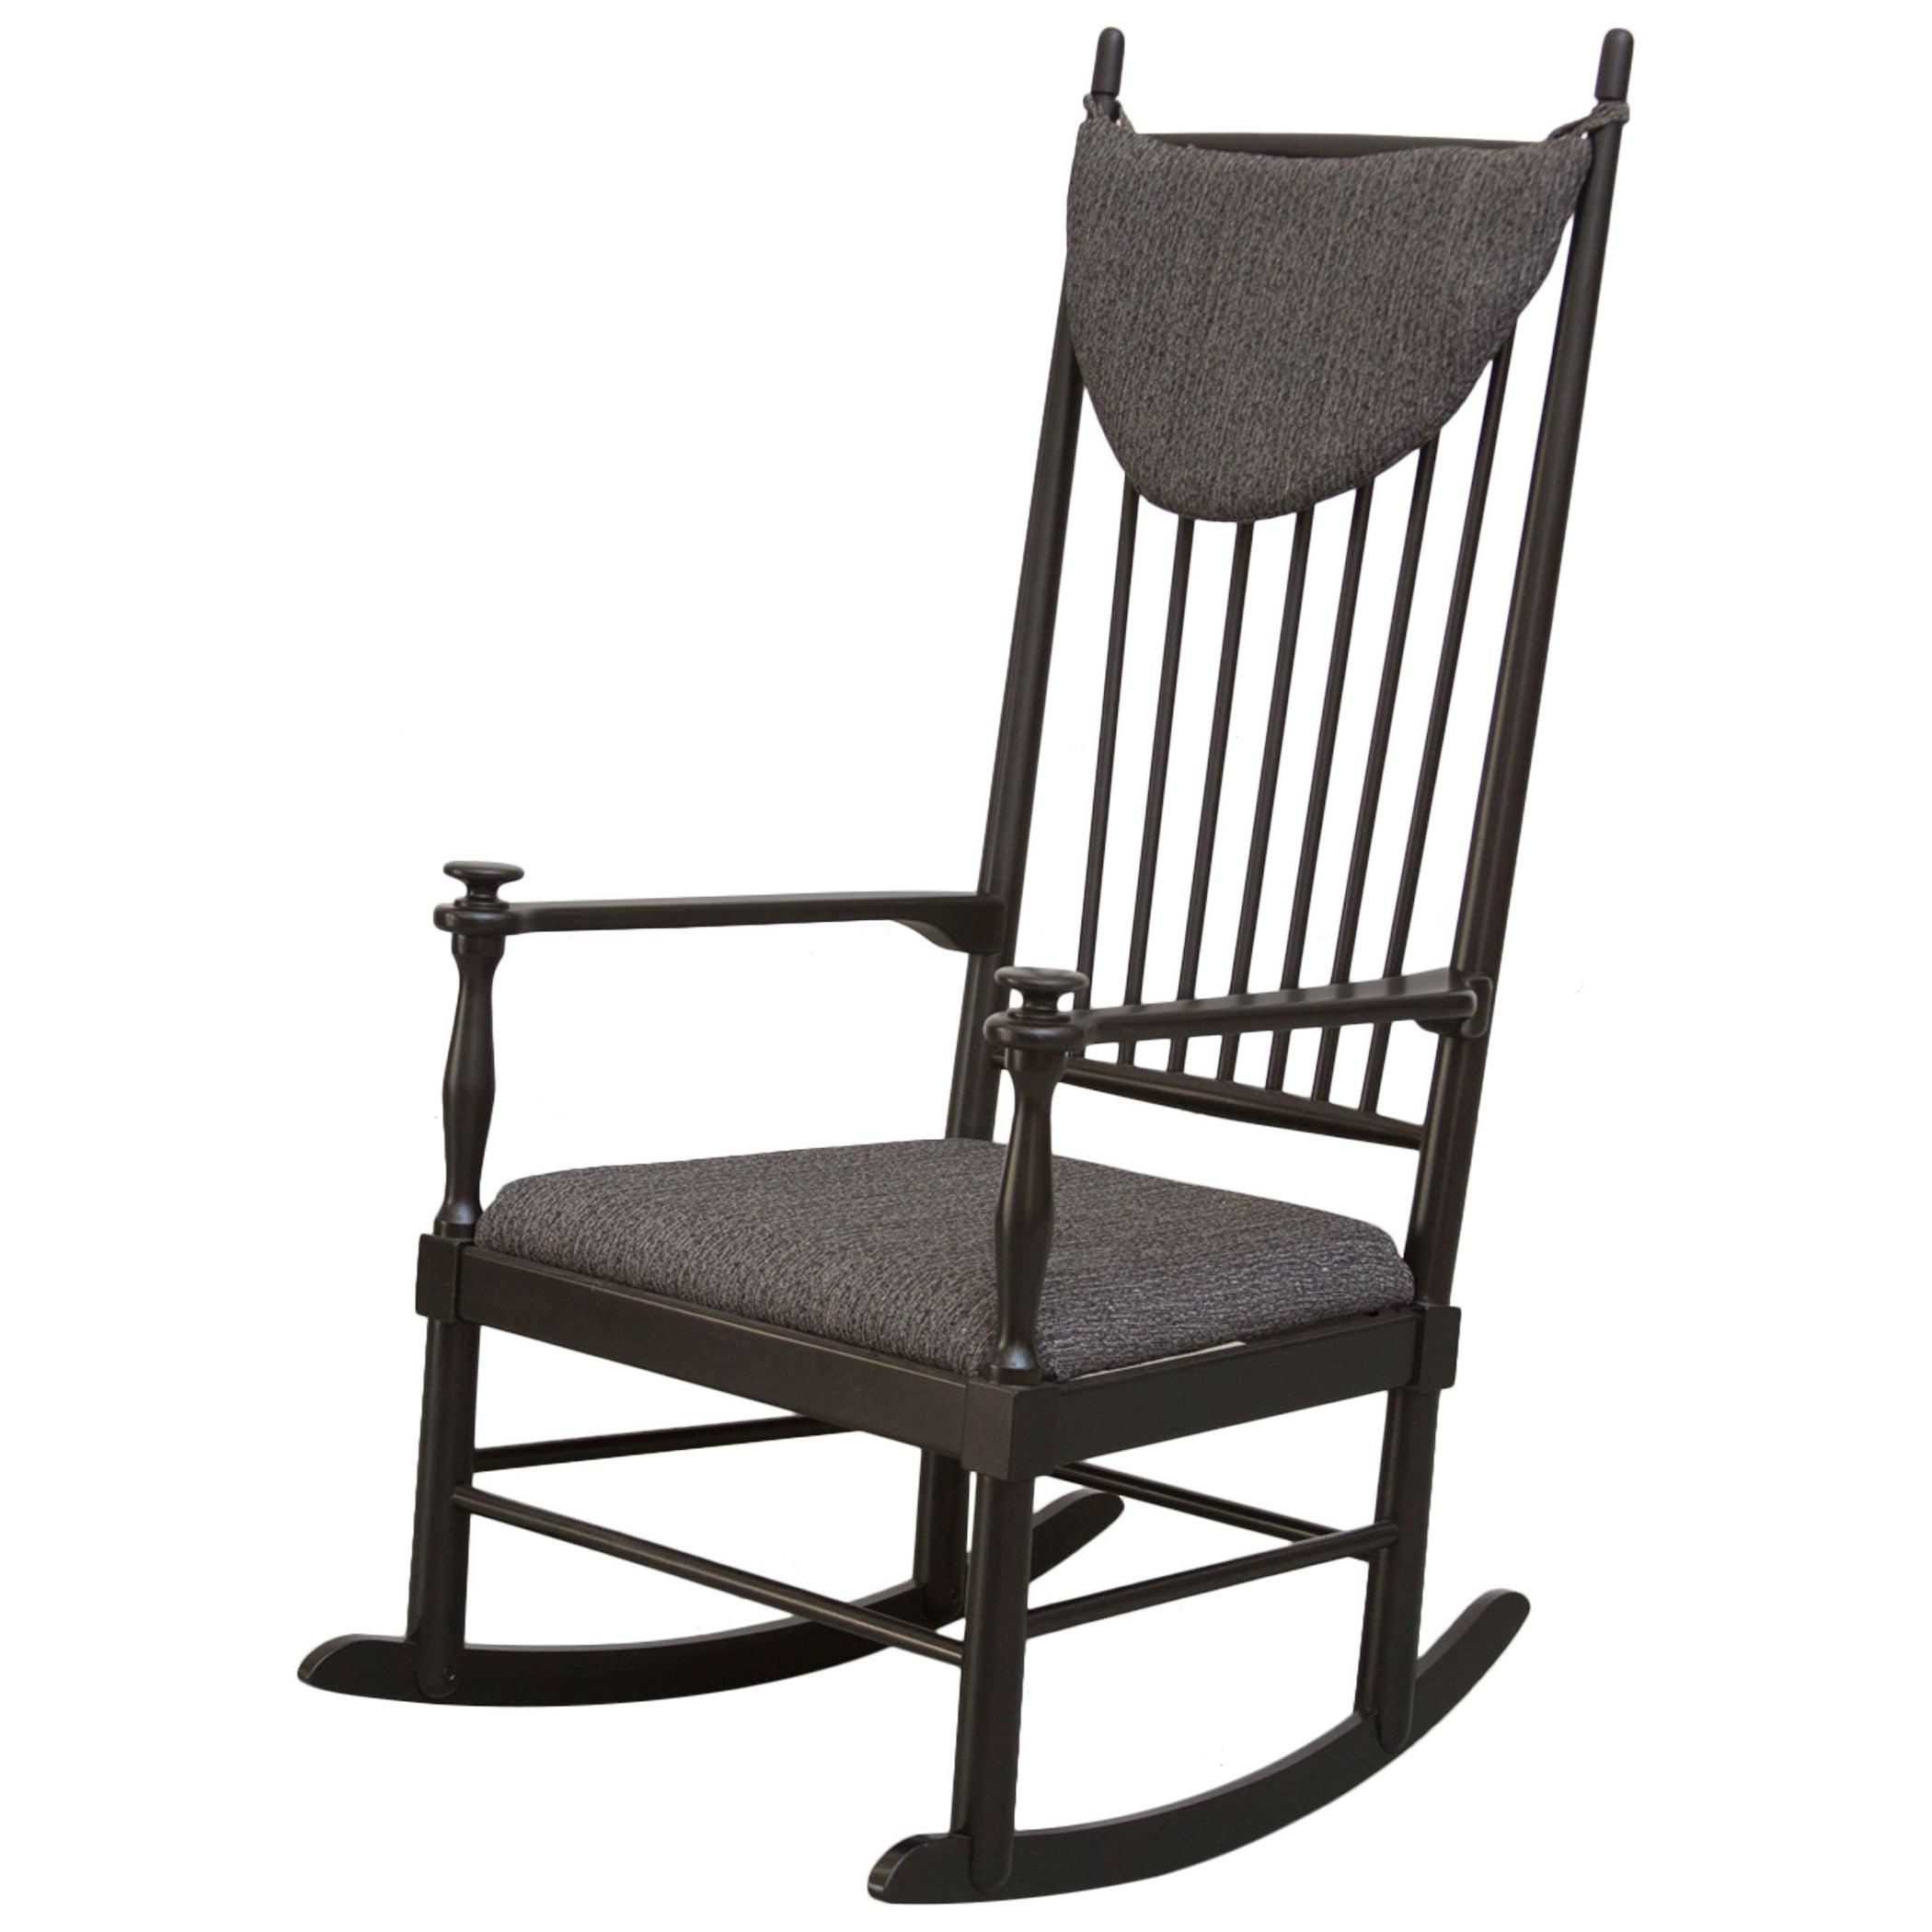 Tapiovaara Style High Back Rocking Chair